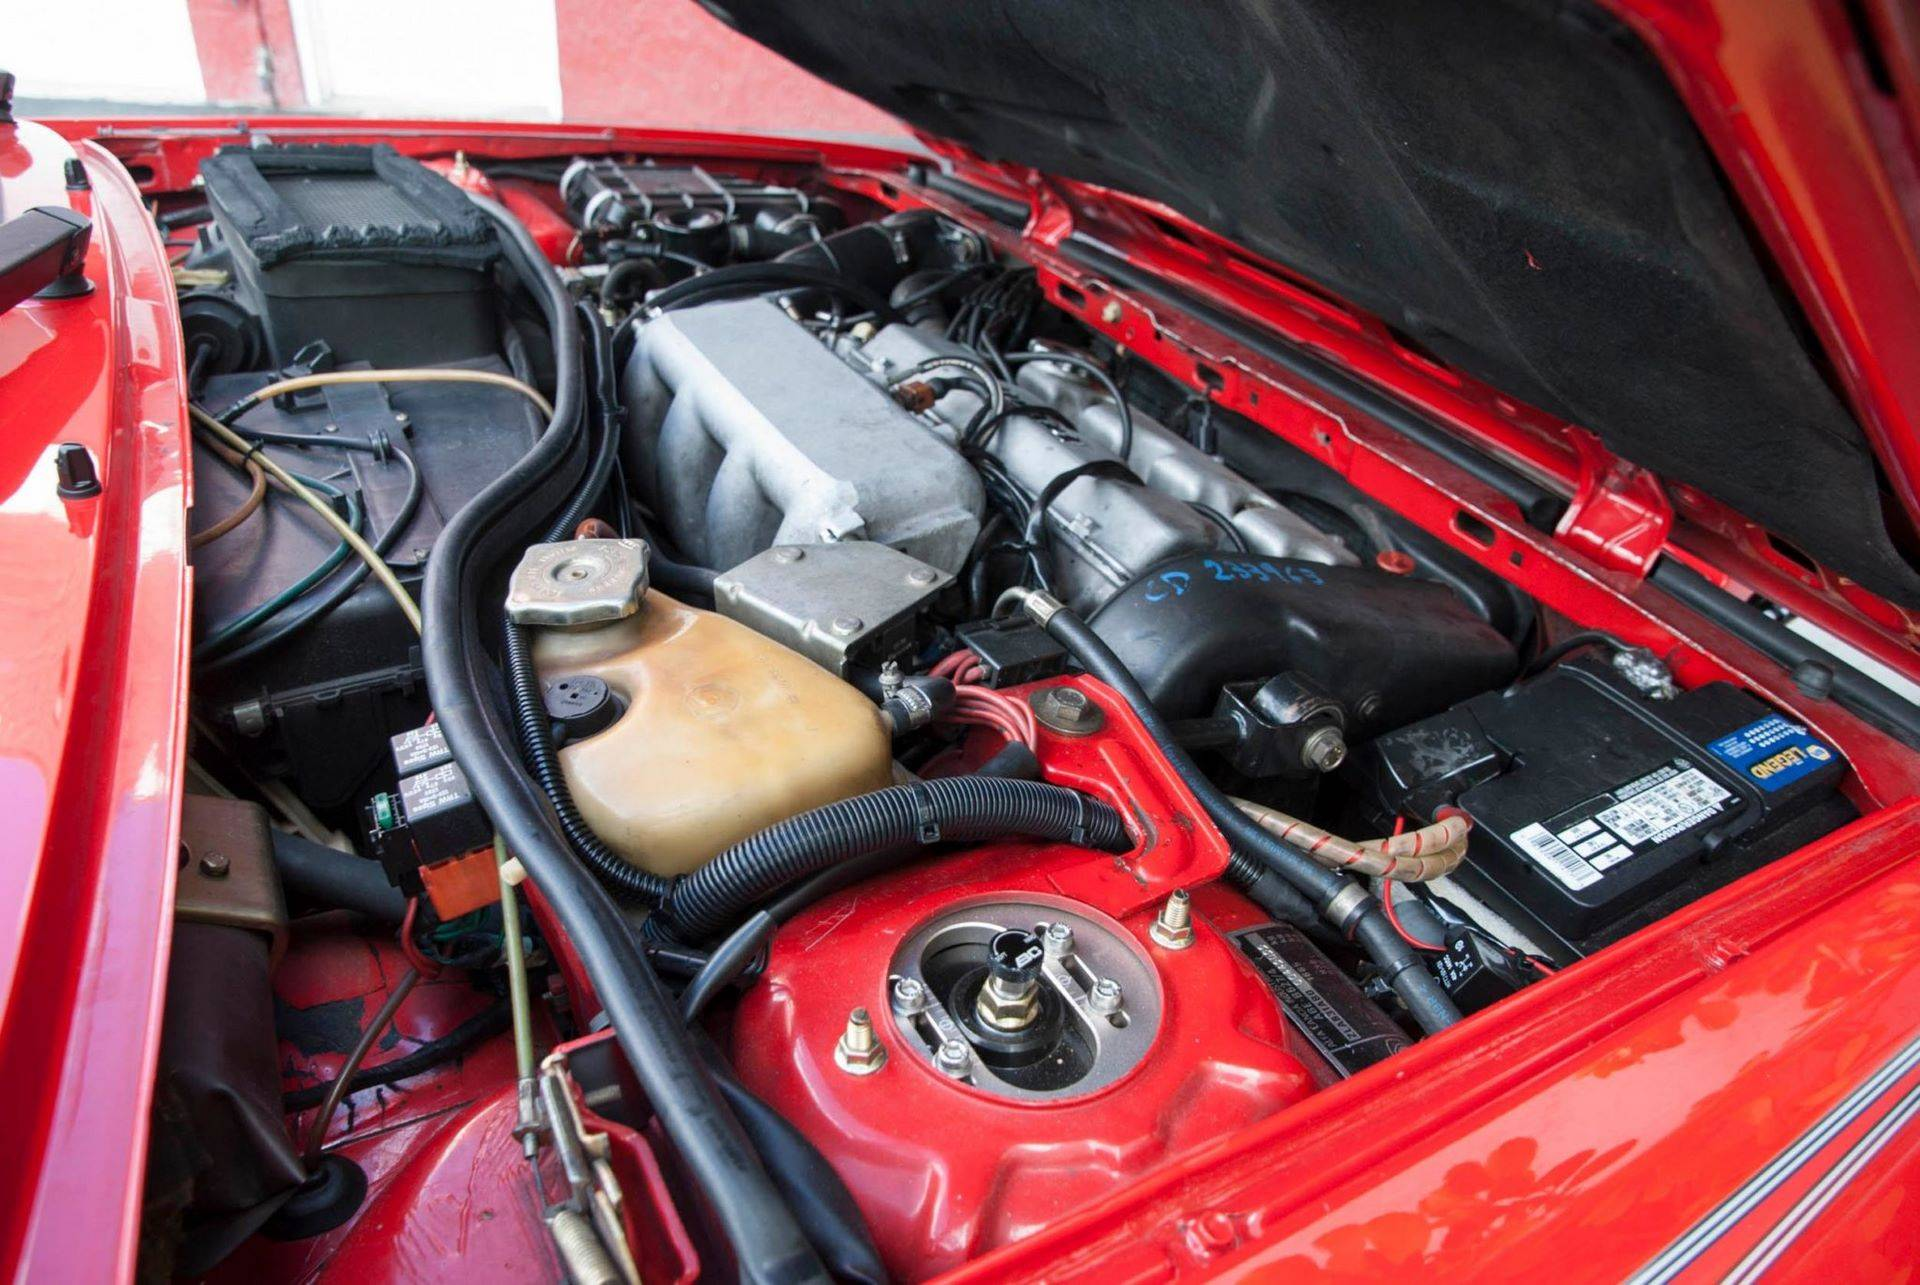 Lancia-Delta-Integrale-8V-1989-28